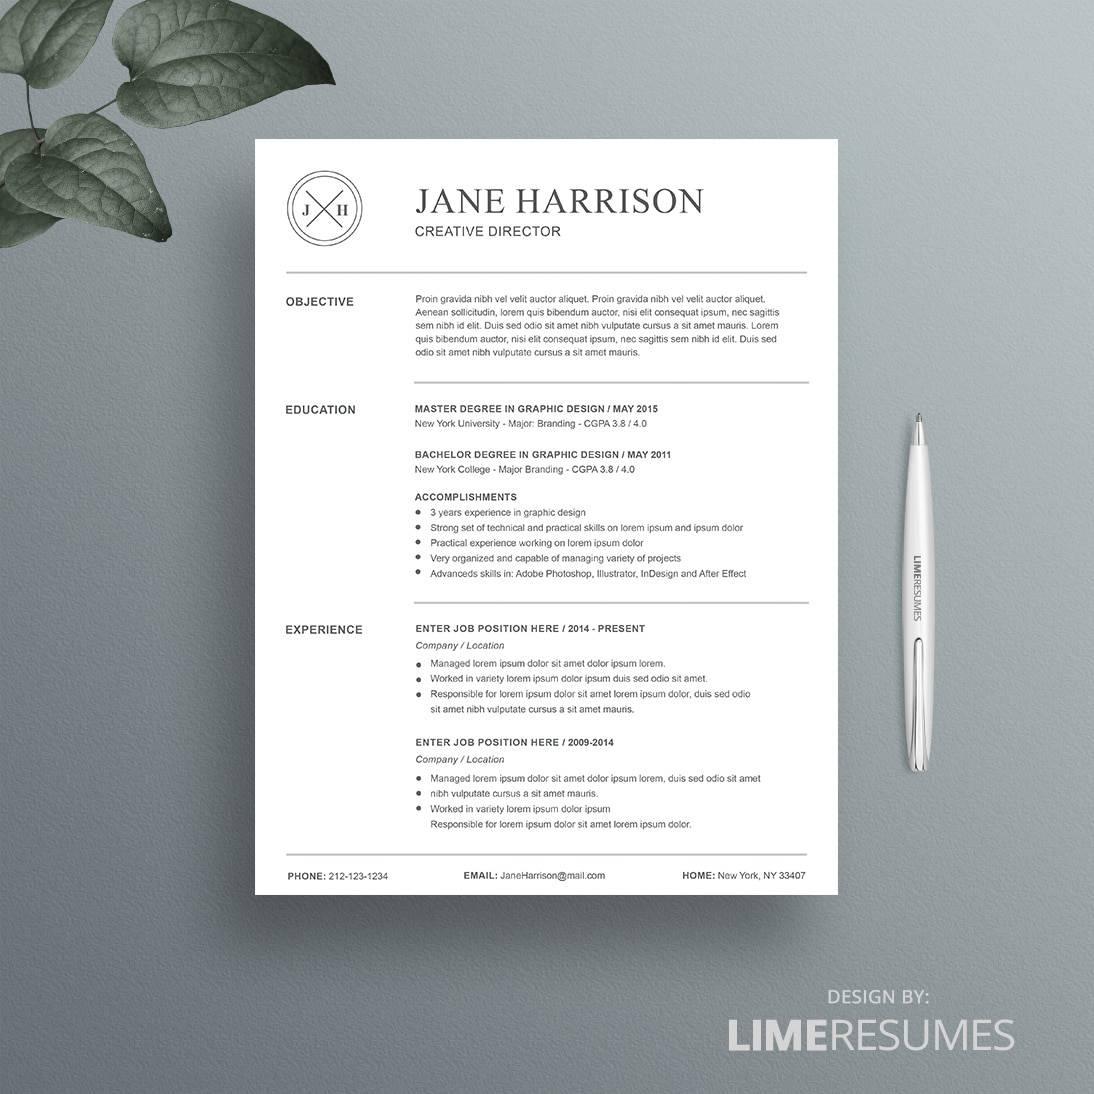 update my resume in indeed sample customer service resume update my resume in indeed getting started your indeed resume indeed blog how resume template